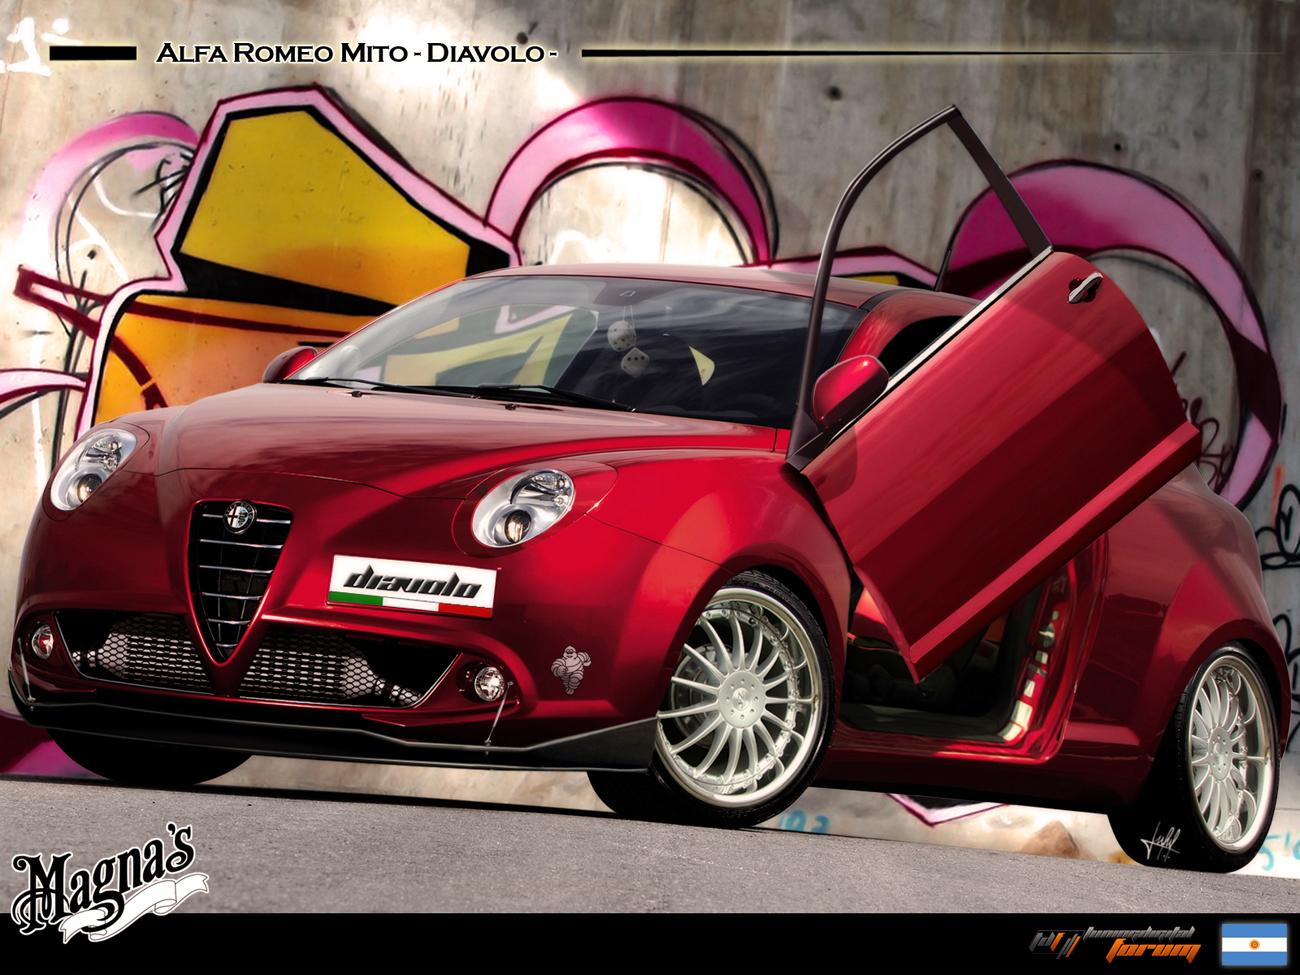 karosserie aerodynamik gta heck alfa romeo forum. Black Bedroom Furniture Sets. Home Design Ideas